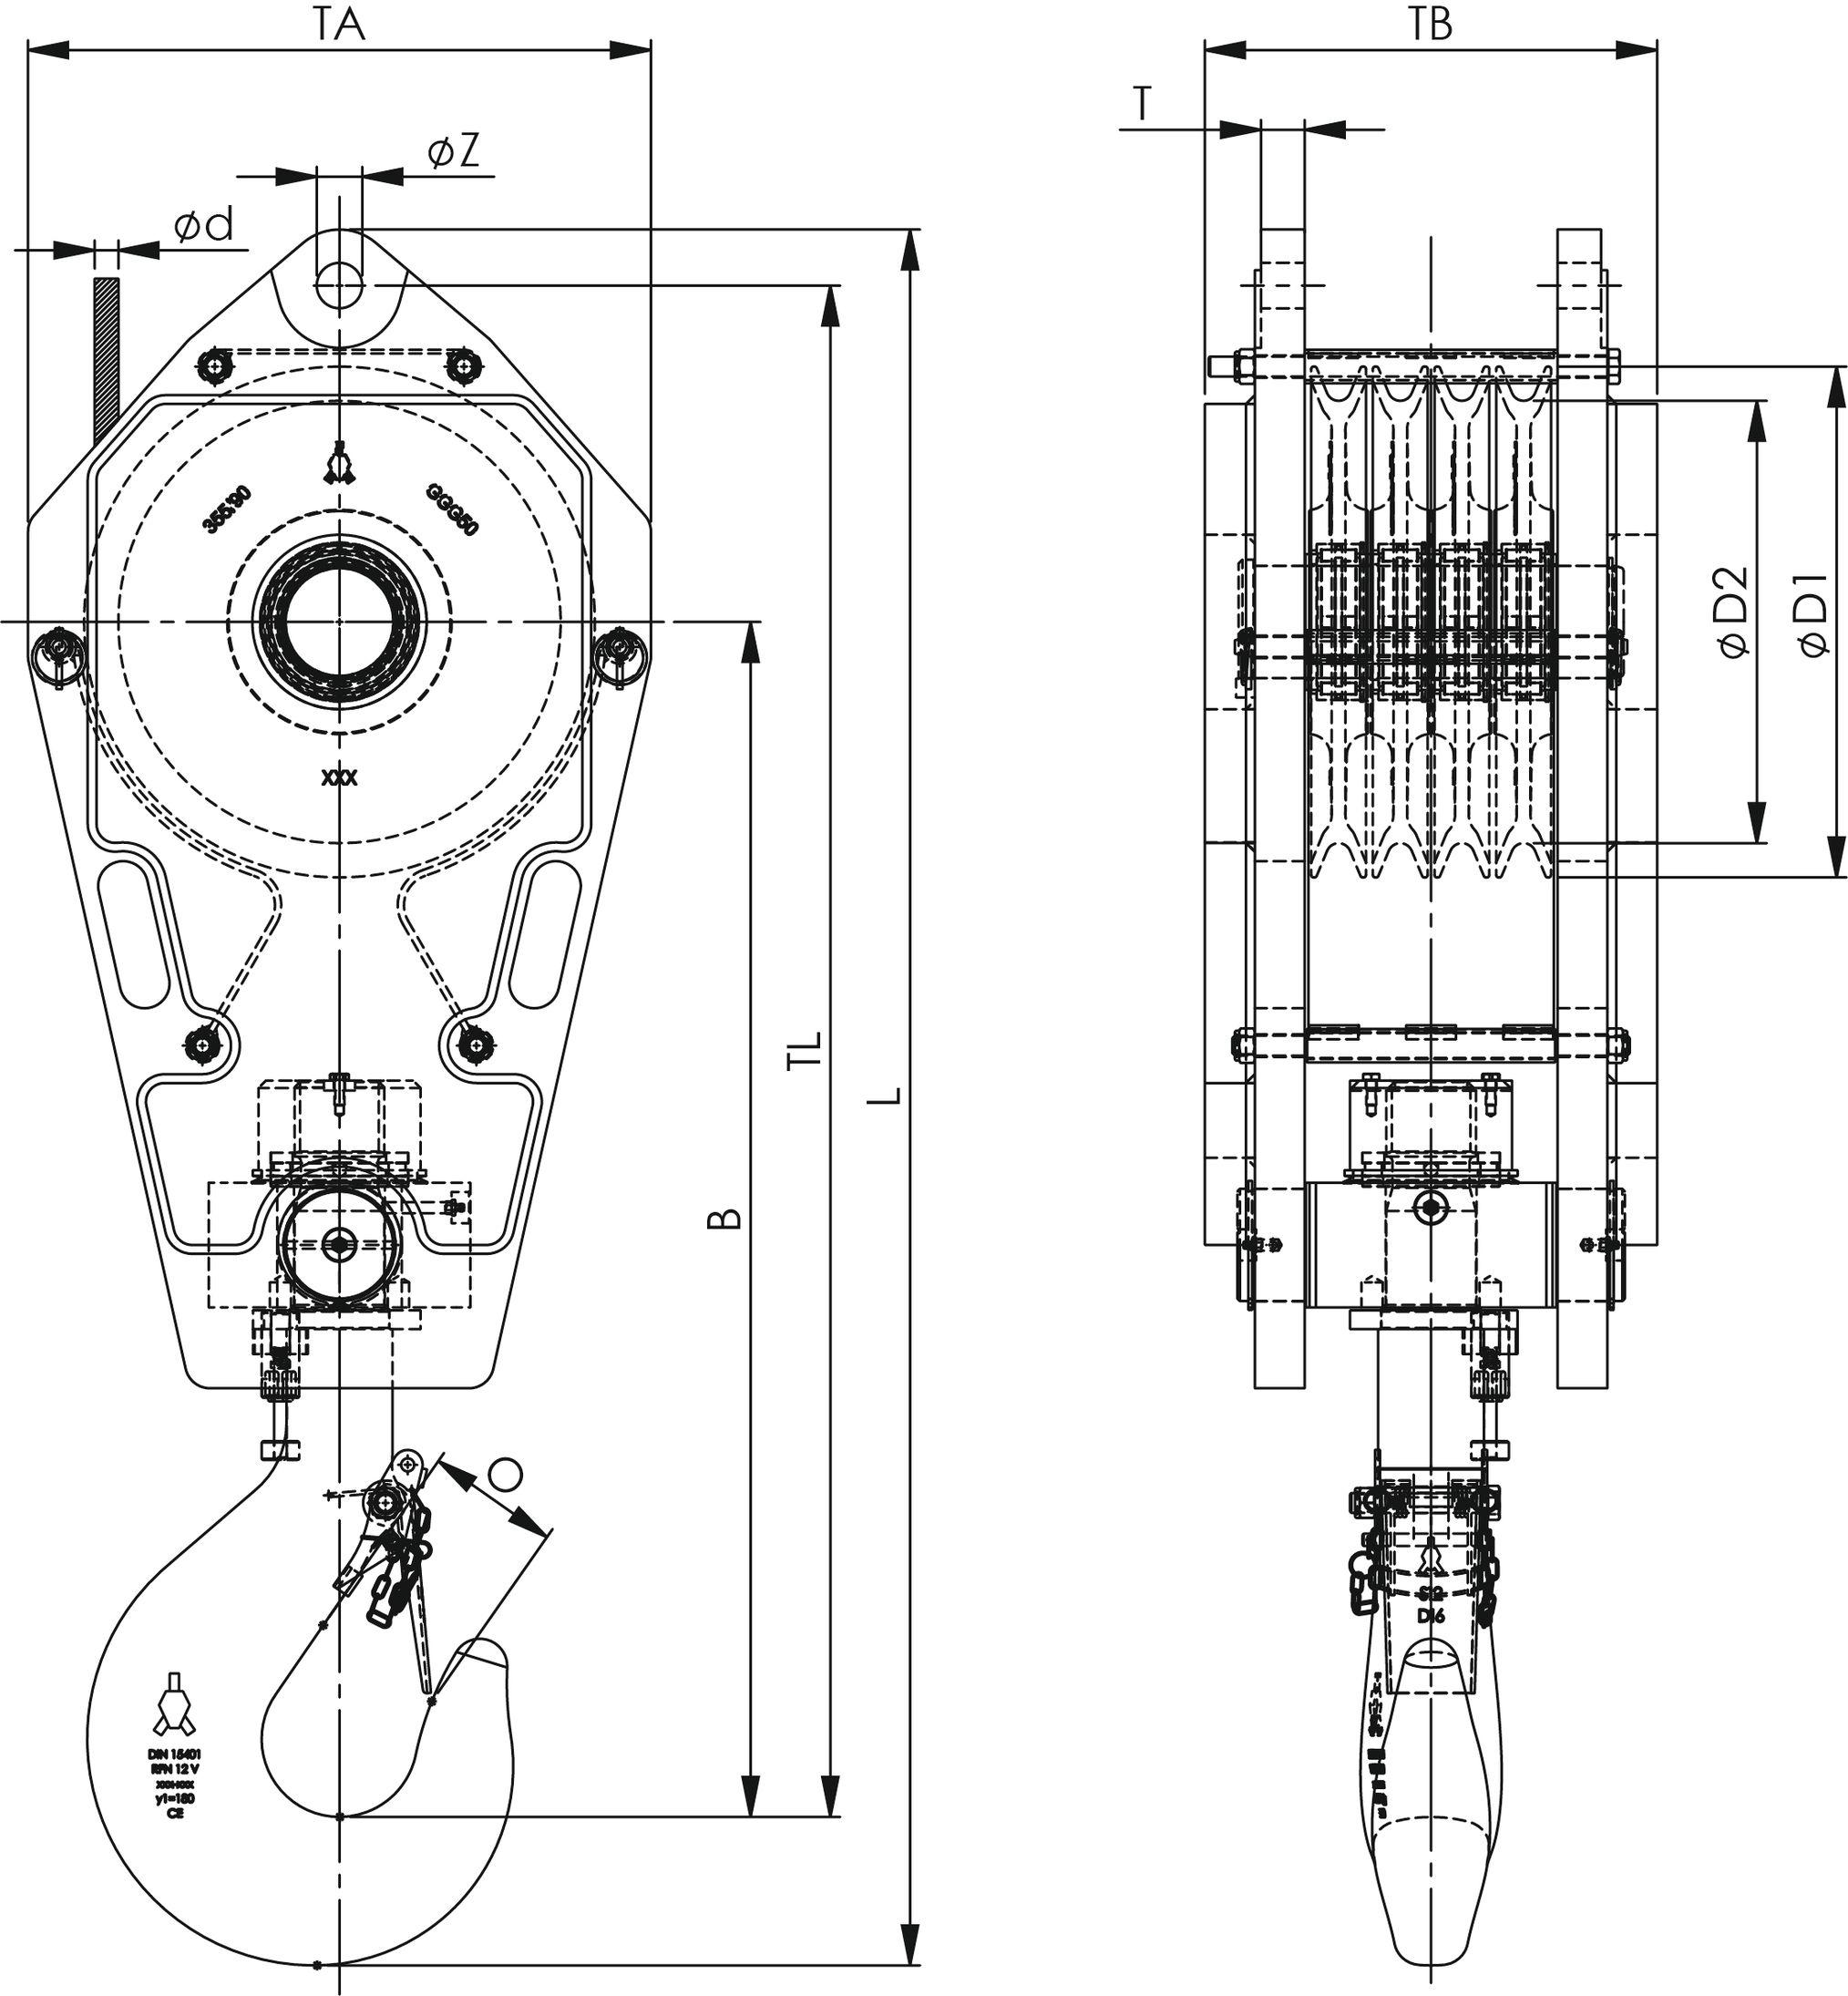 sheave reeving diagram wiring diagram third levelsheave crane block reeving diagram bridge wiring schematic crane reeving fast reeve crane blocks 4 sheave